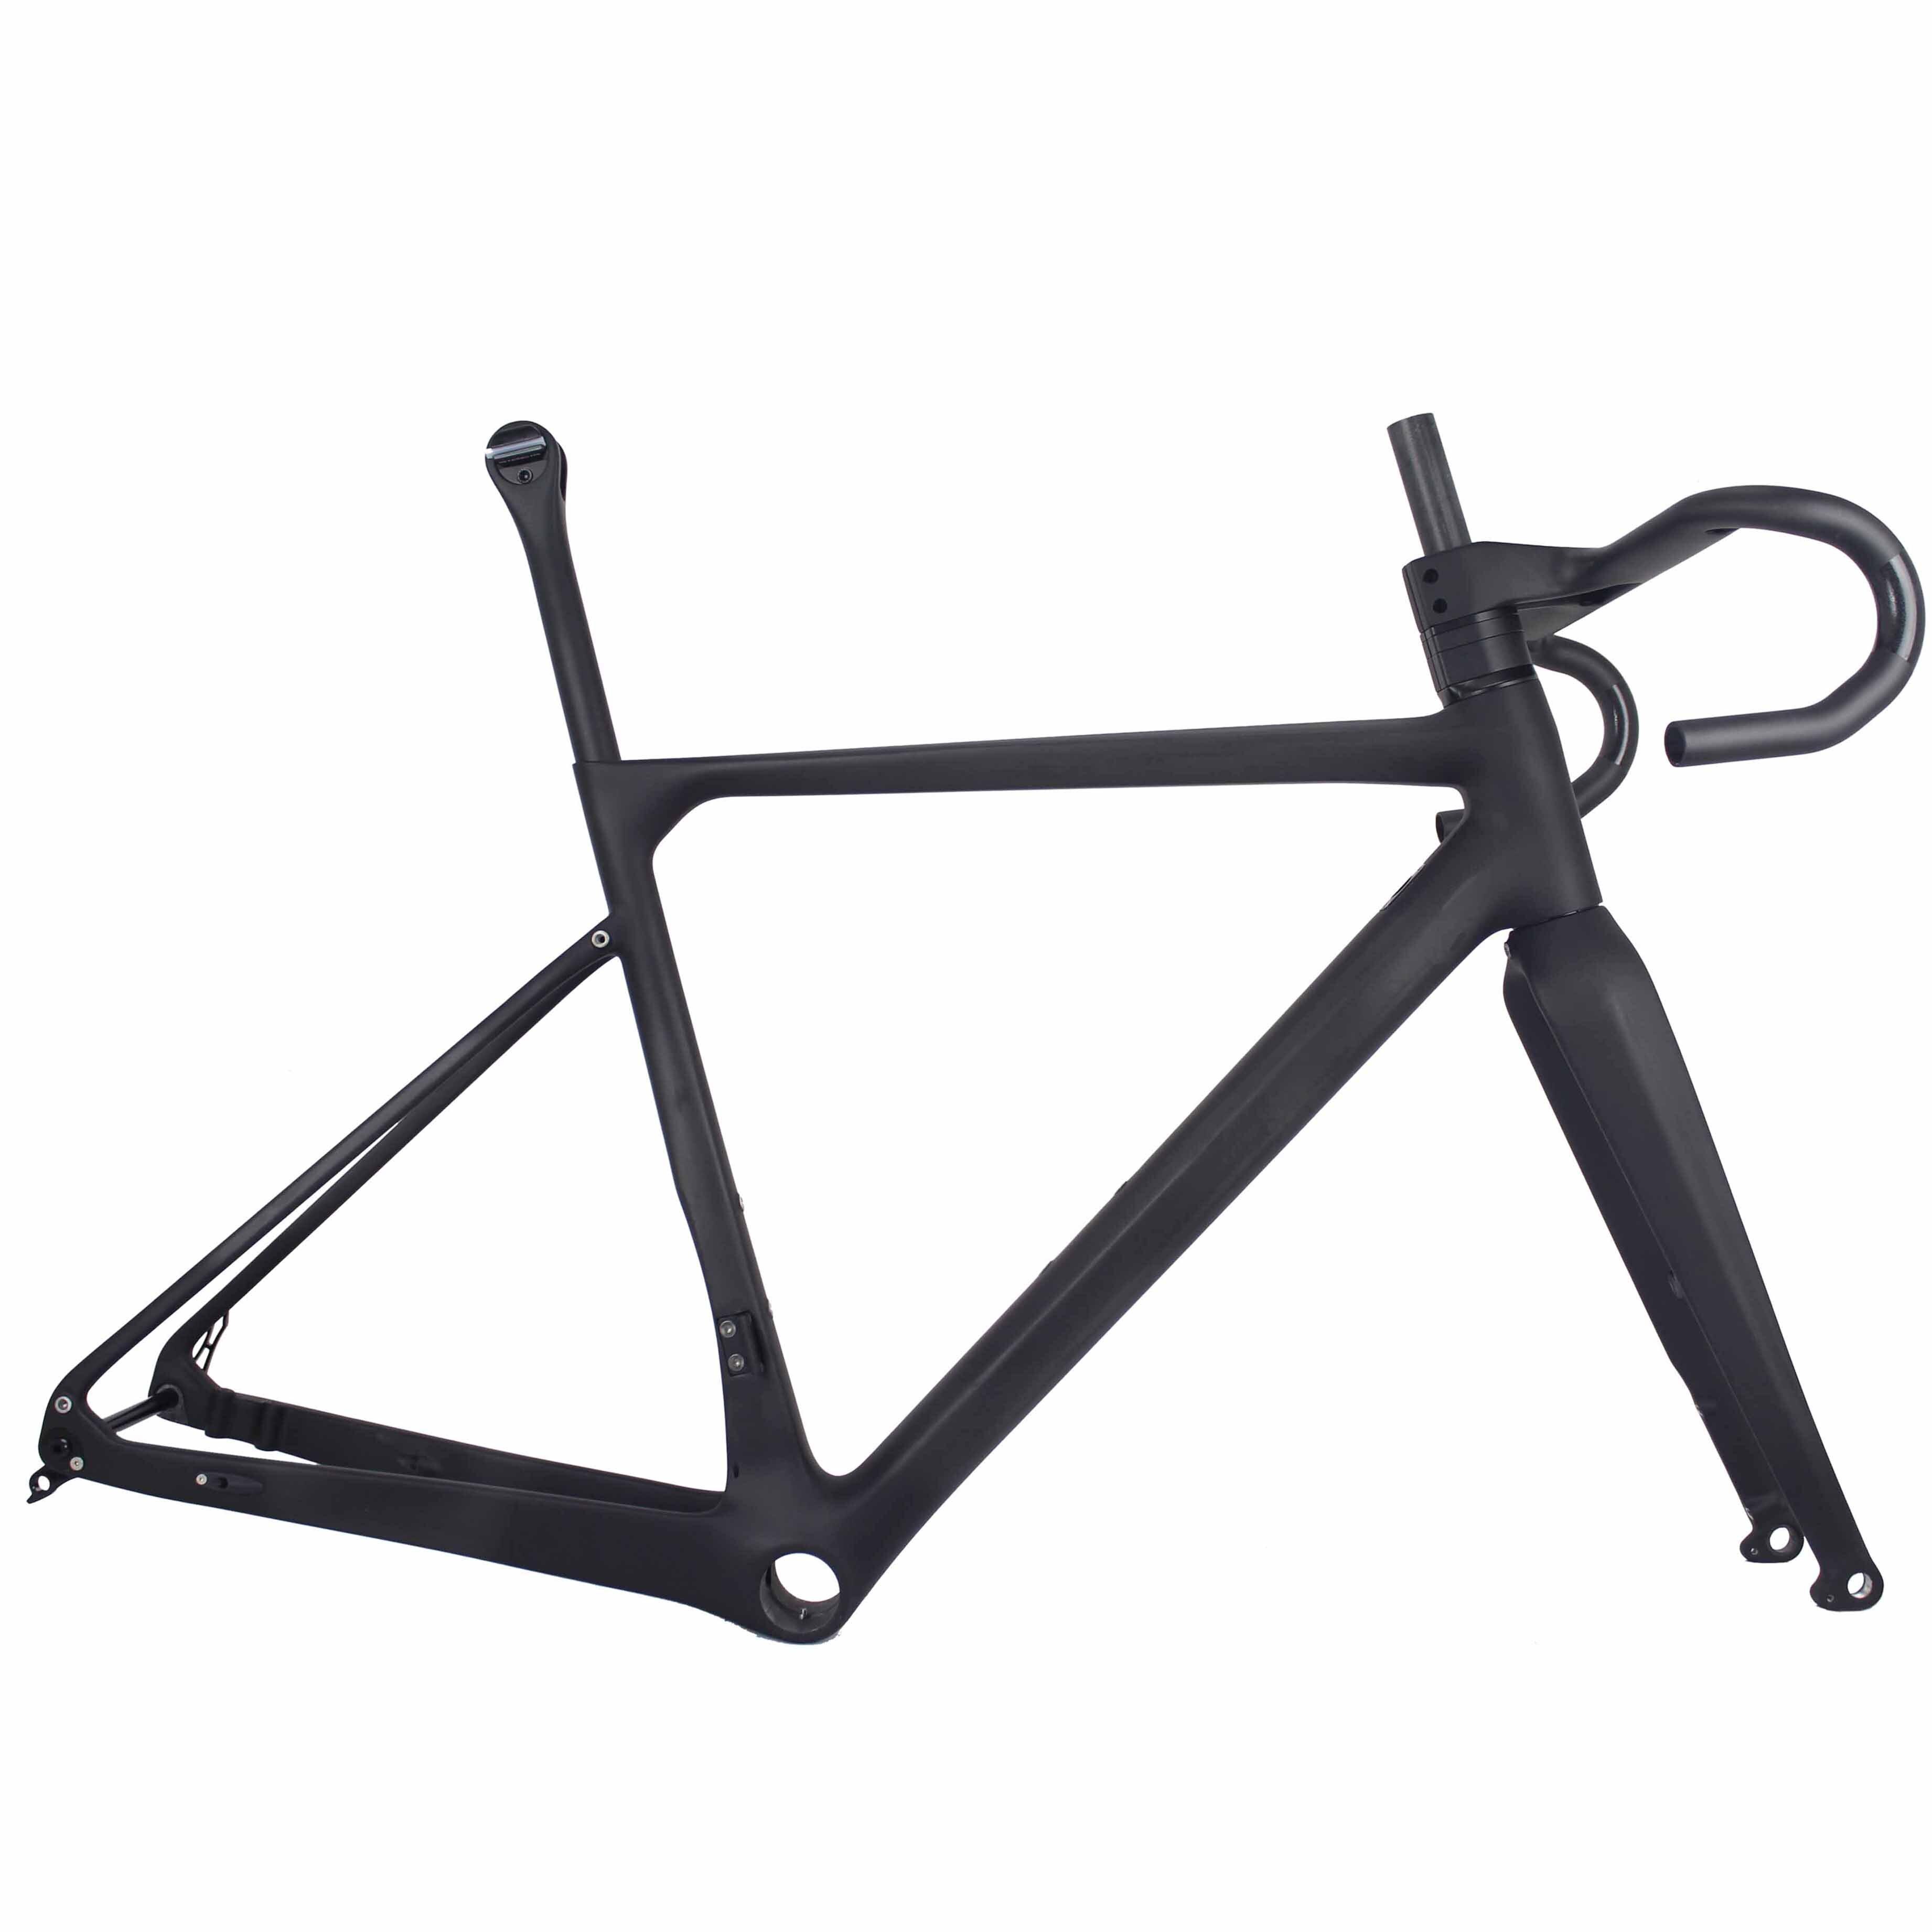 2019 China Factory New Design , Toray Full Carbon Fiber Gravel Bike Frame GR039 , Bicycle GRAVEL Frame Factory Deirect Sale